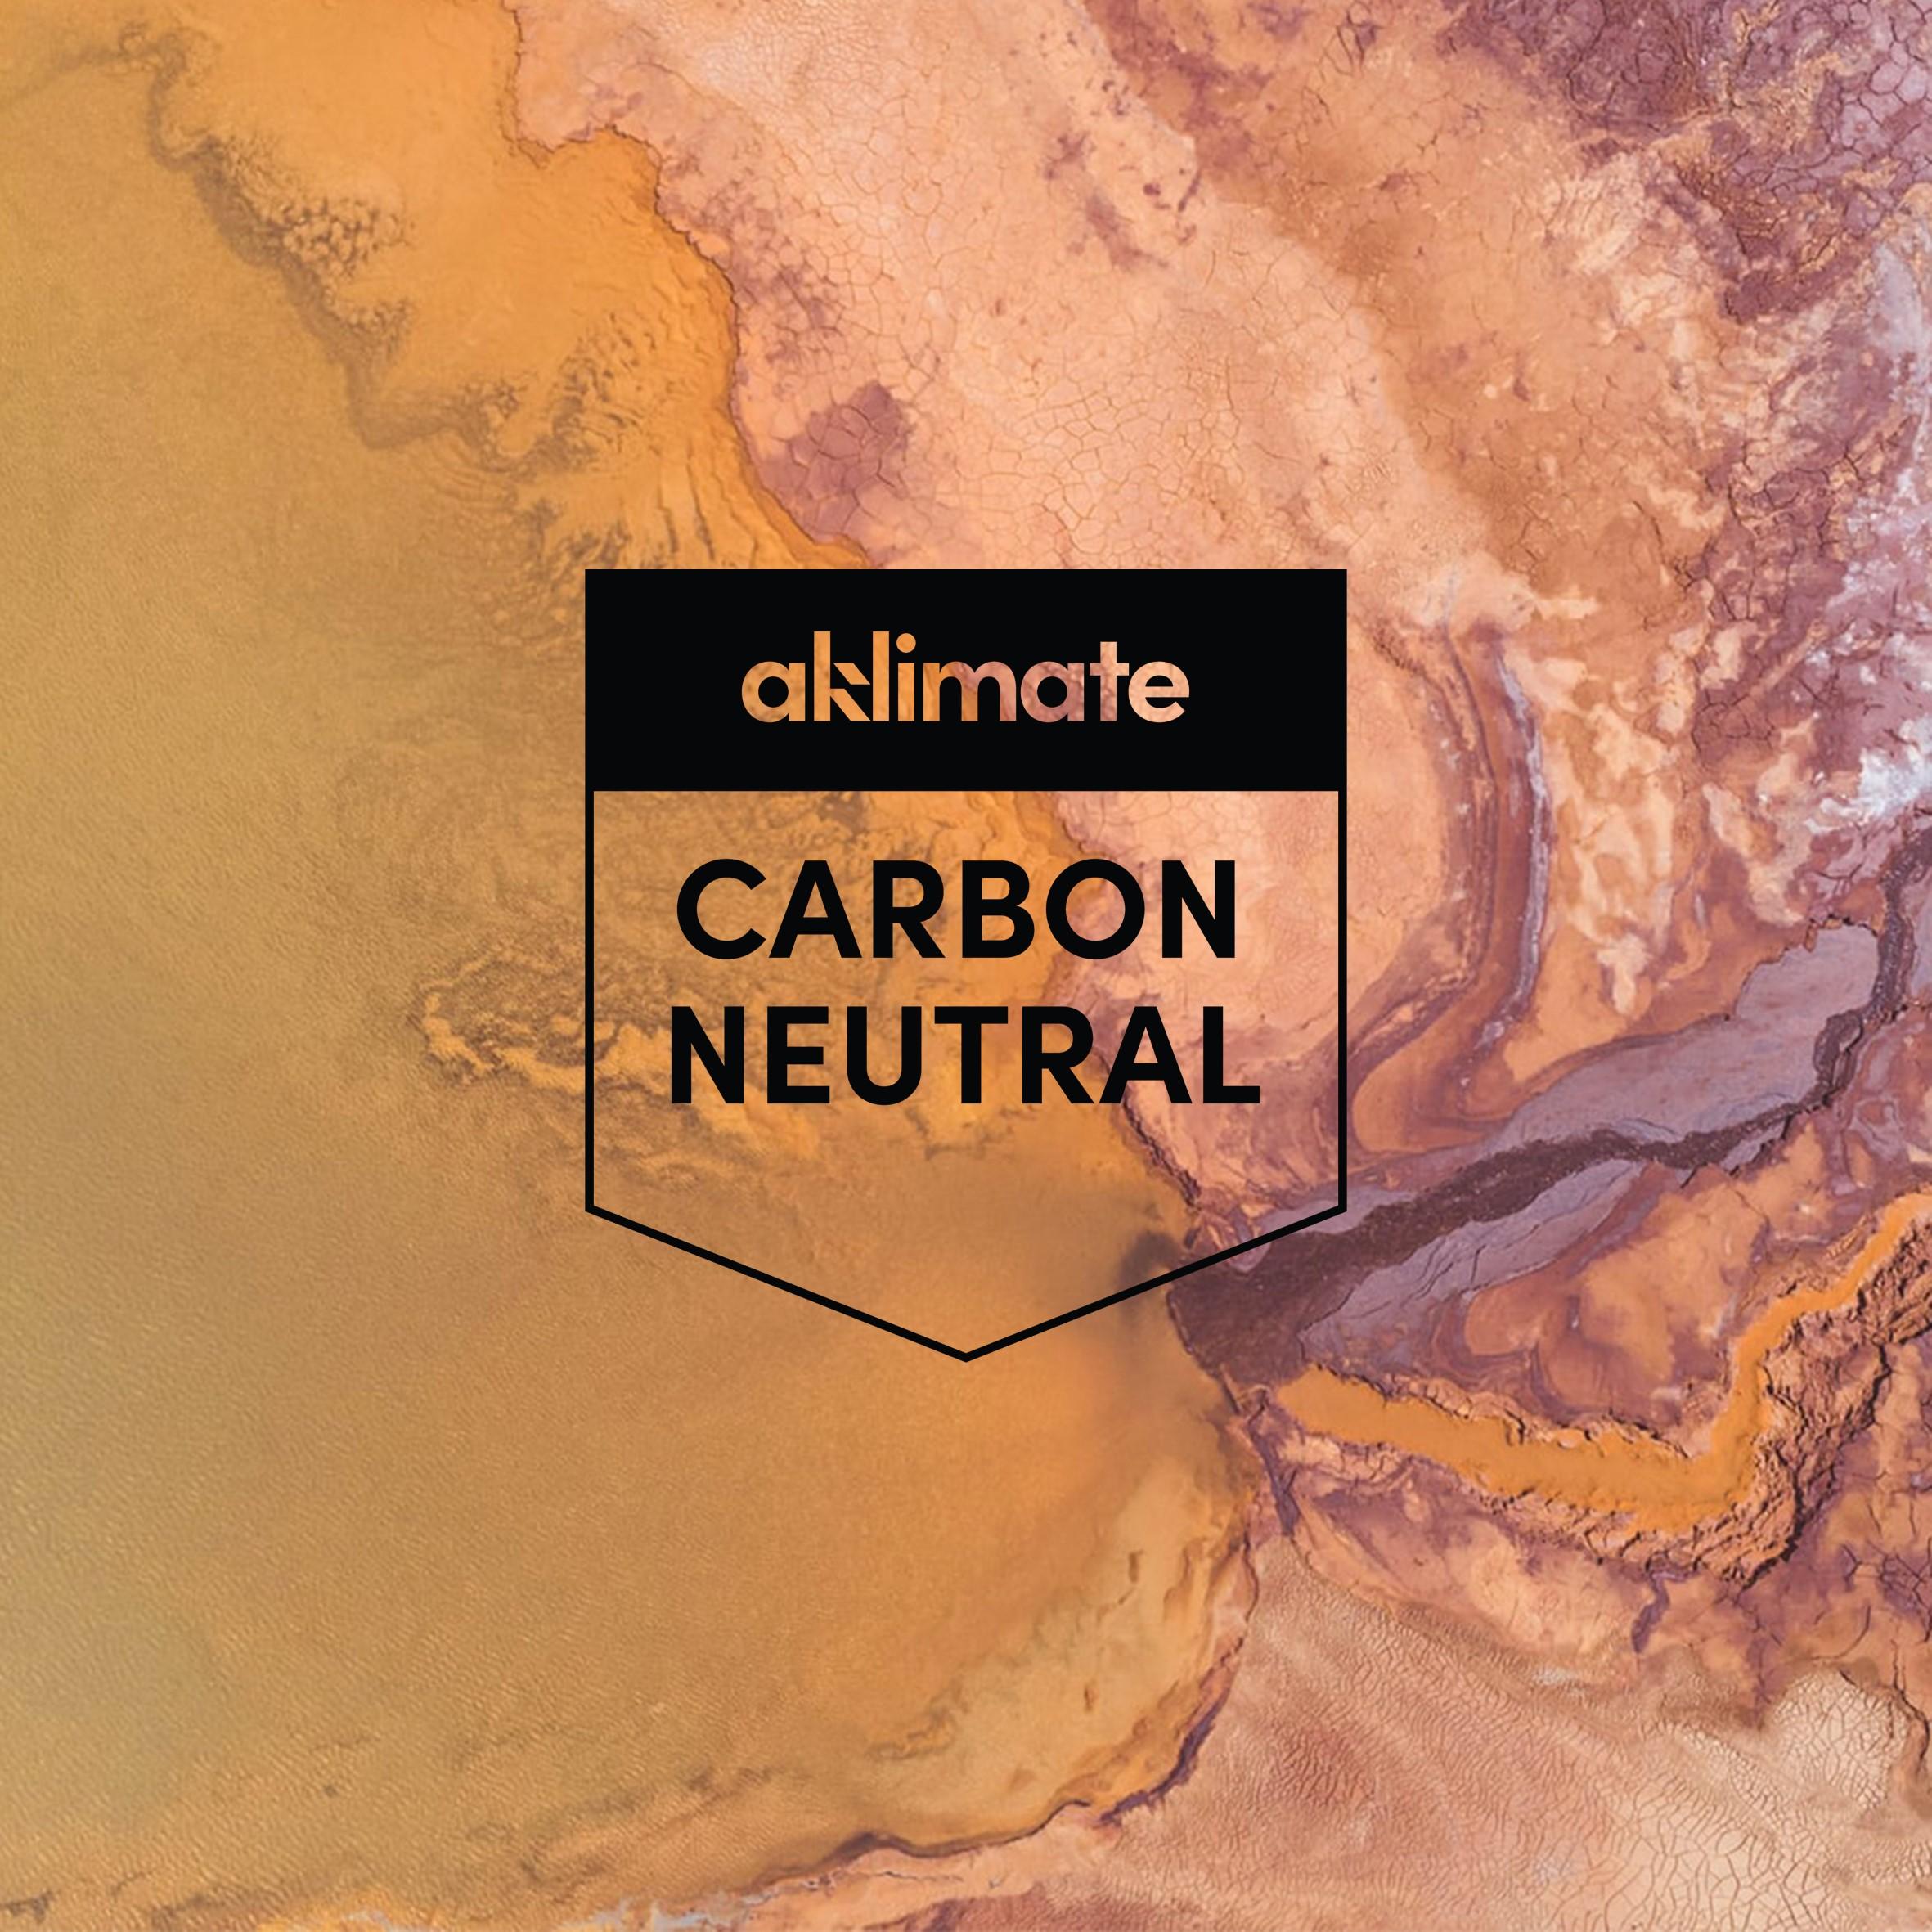 aklimate Carbon Neutral